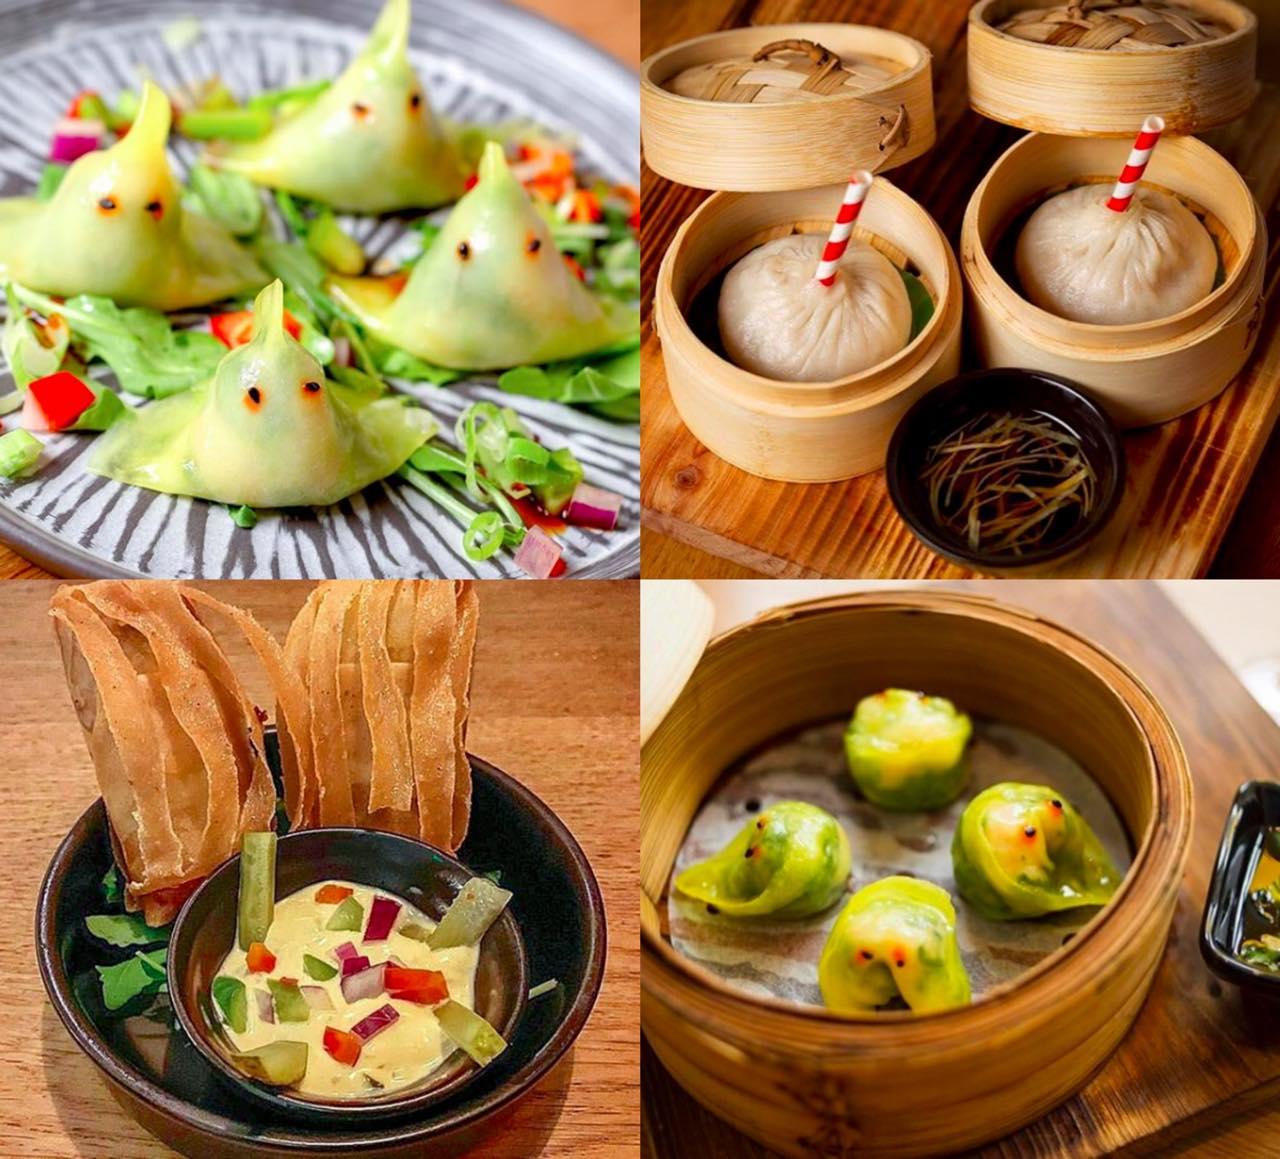 Images from the restaurant's Instagram  右上がPork & Crab Soup Dumplings。擬人化したり、形を工夫したりした点心が楽しい♡